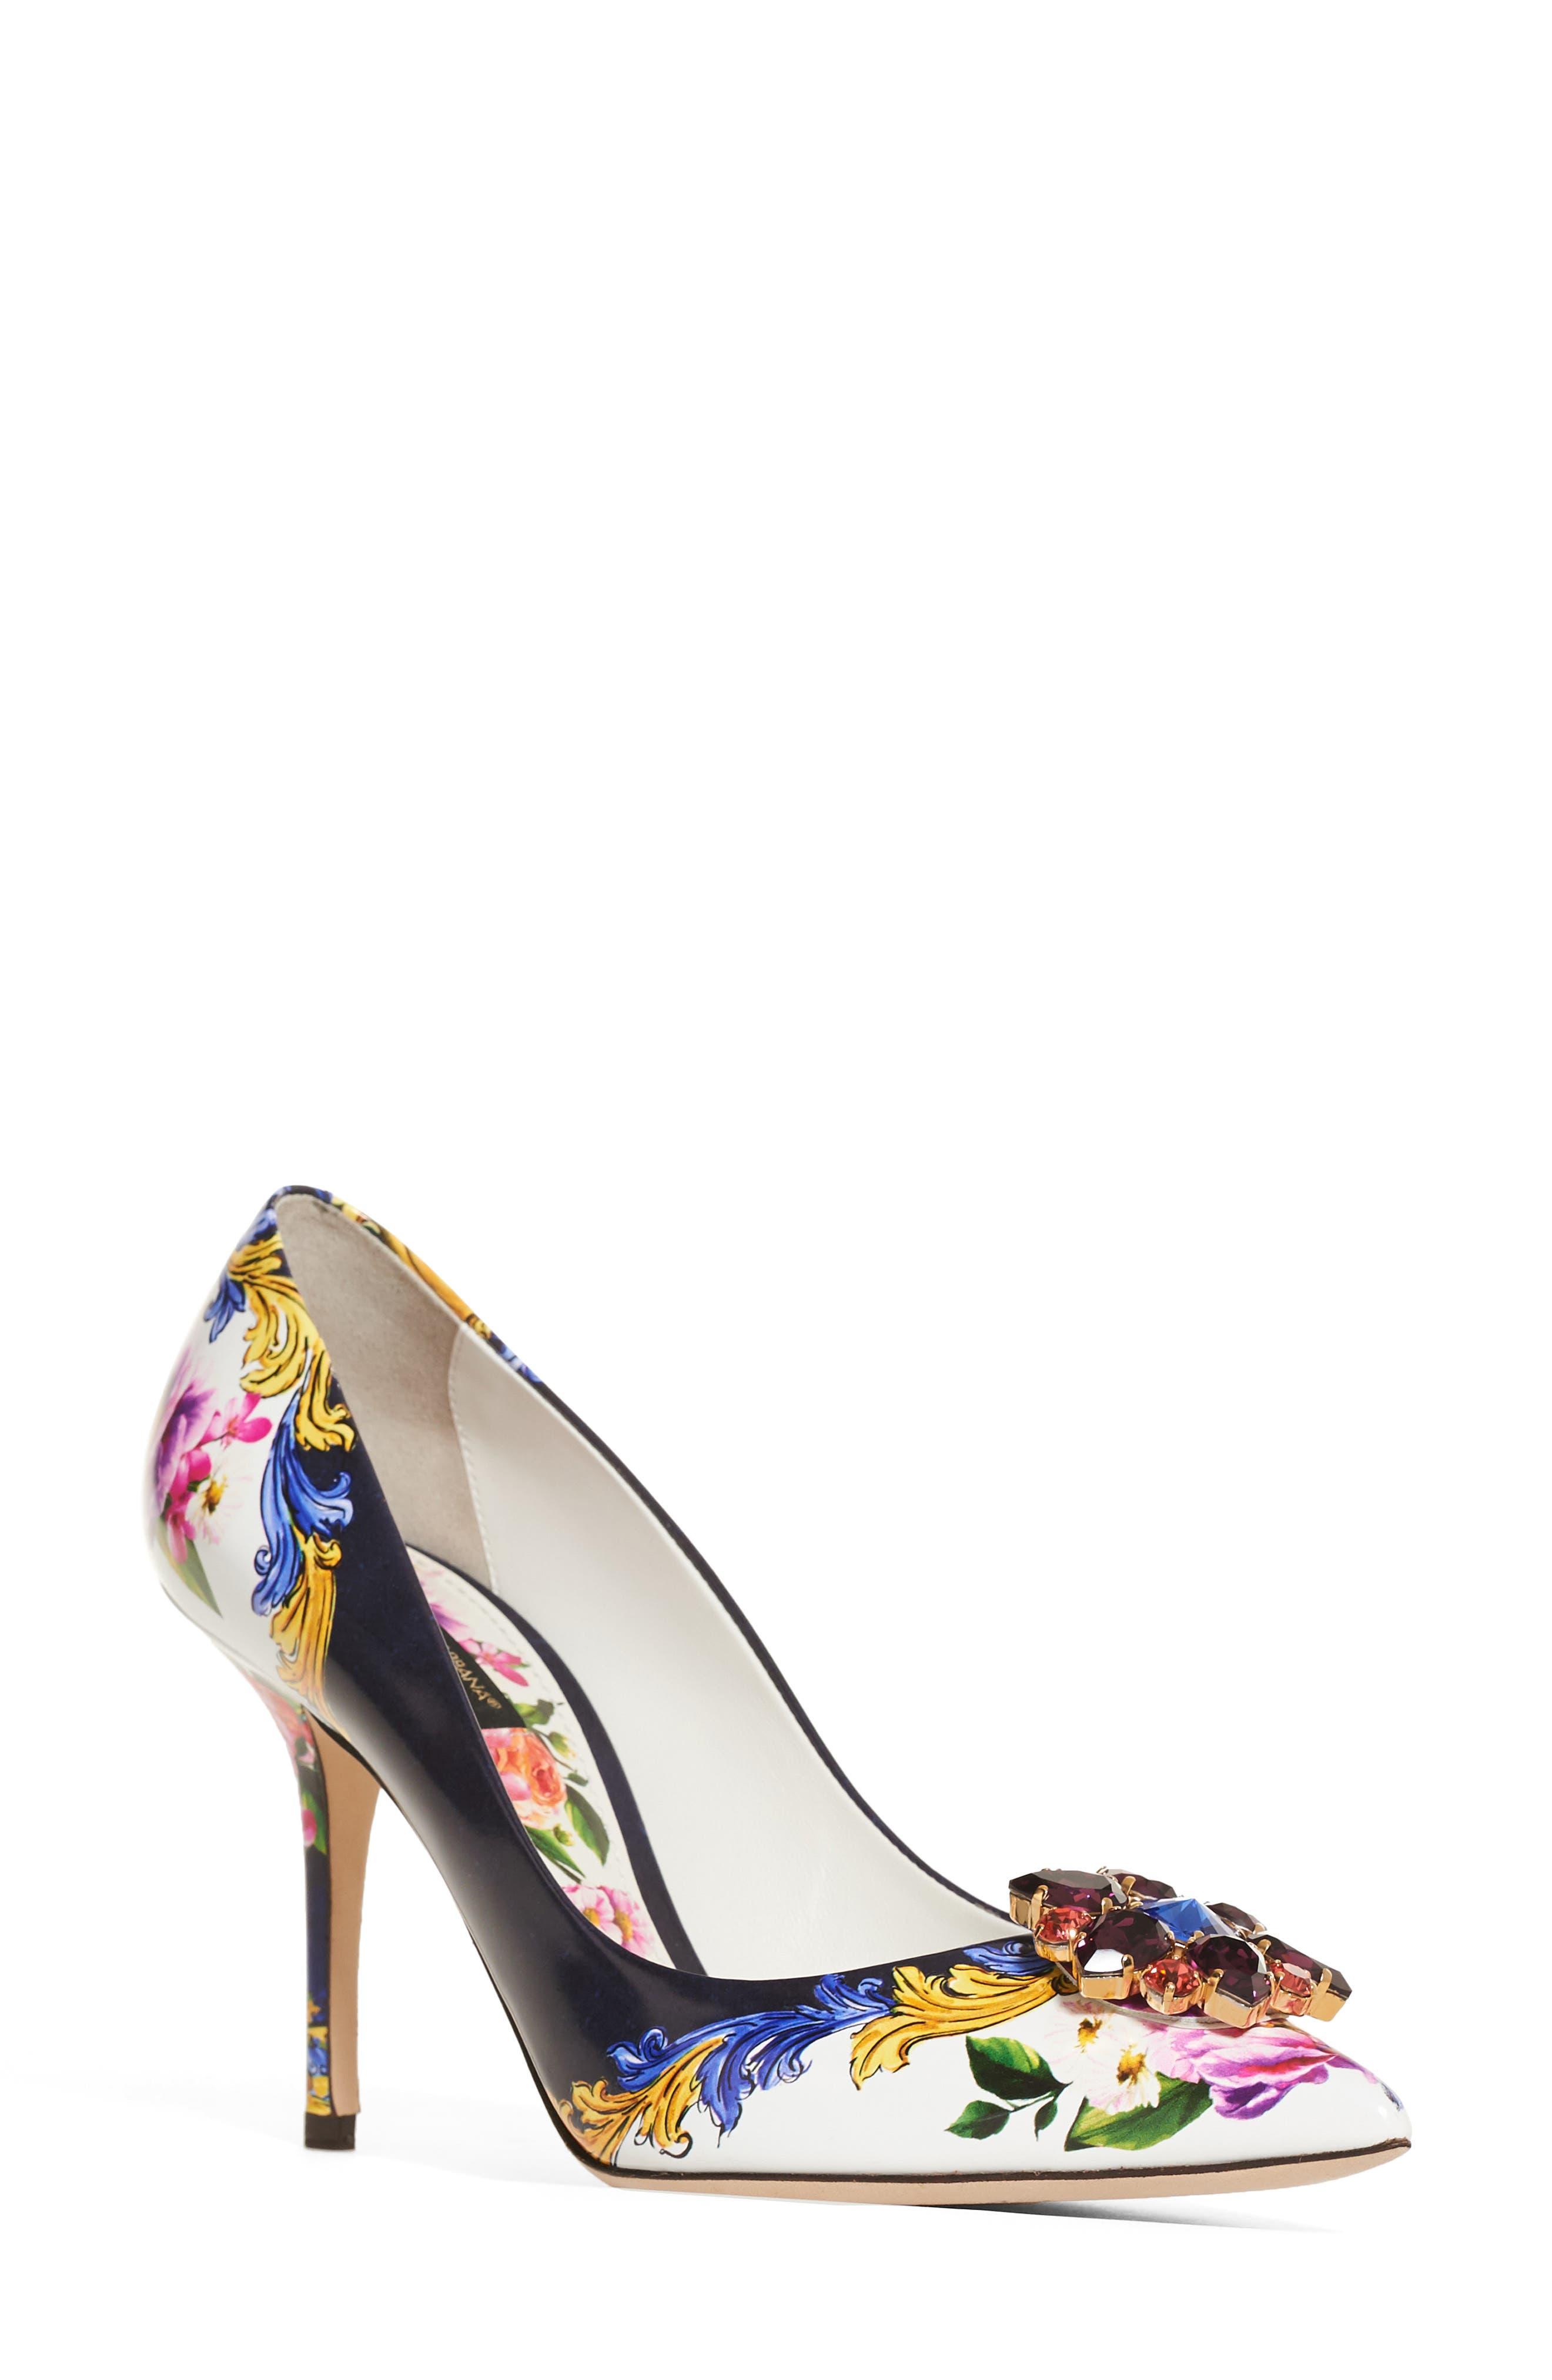 Dolce & Gabbana Print Pump,                         Main,                         color, Navy/ White Floral